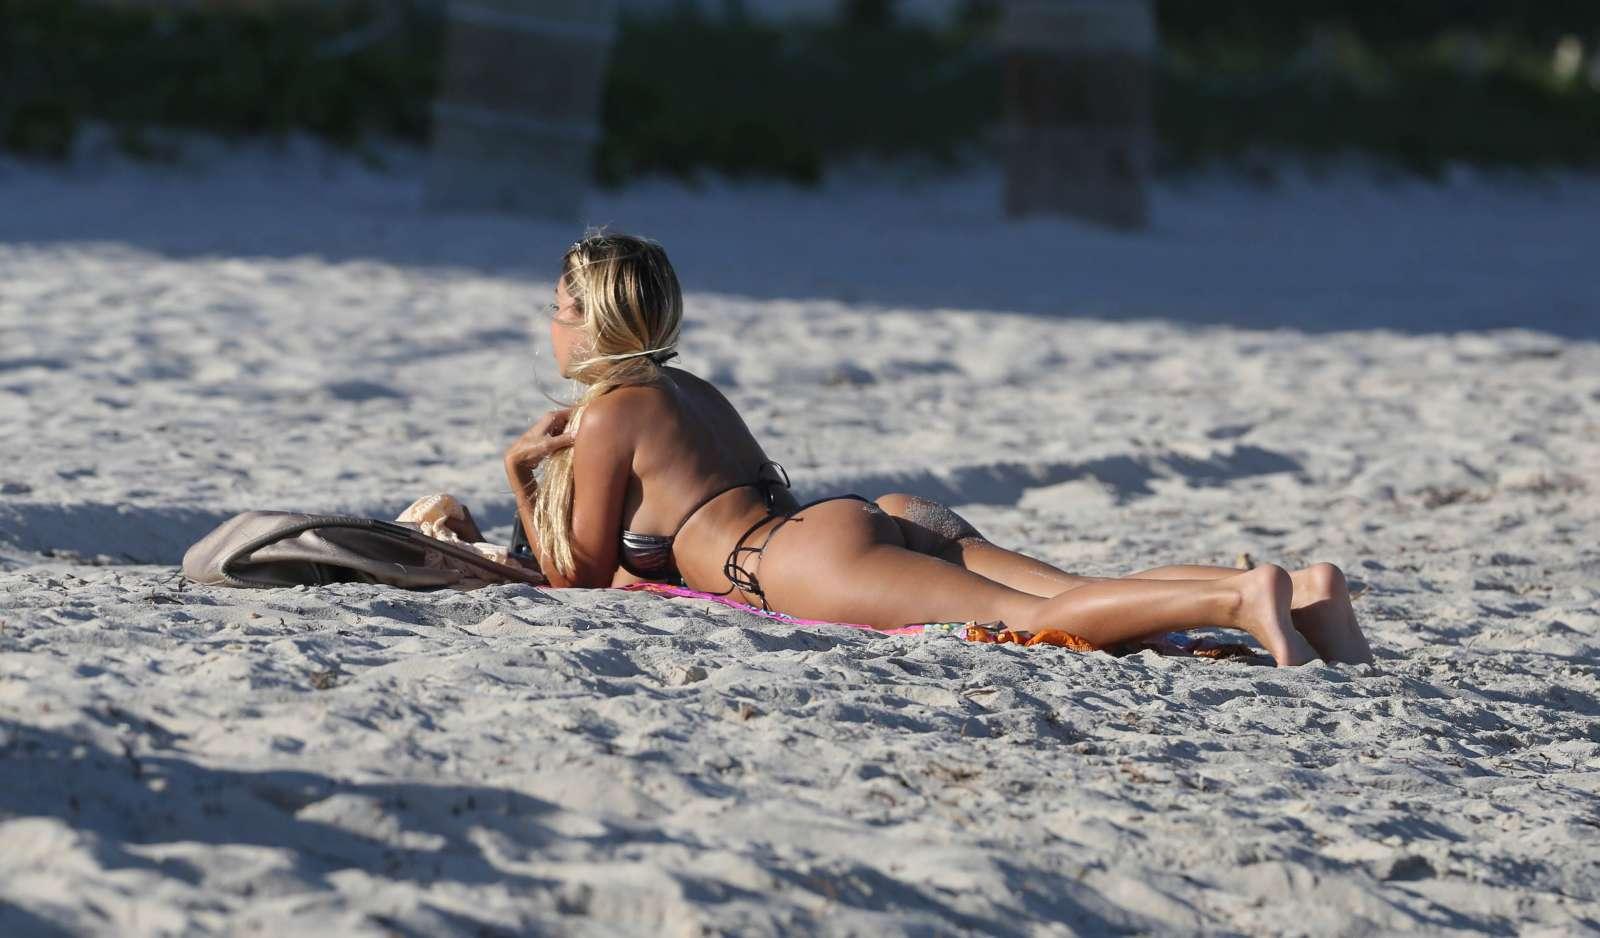 Maria Hering 2017 : Maria Hering in Bikini 2017 -16